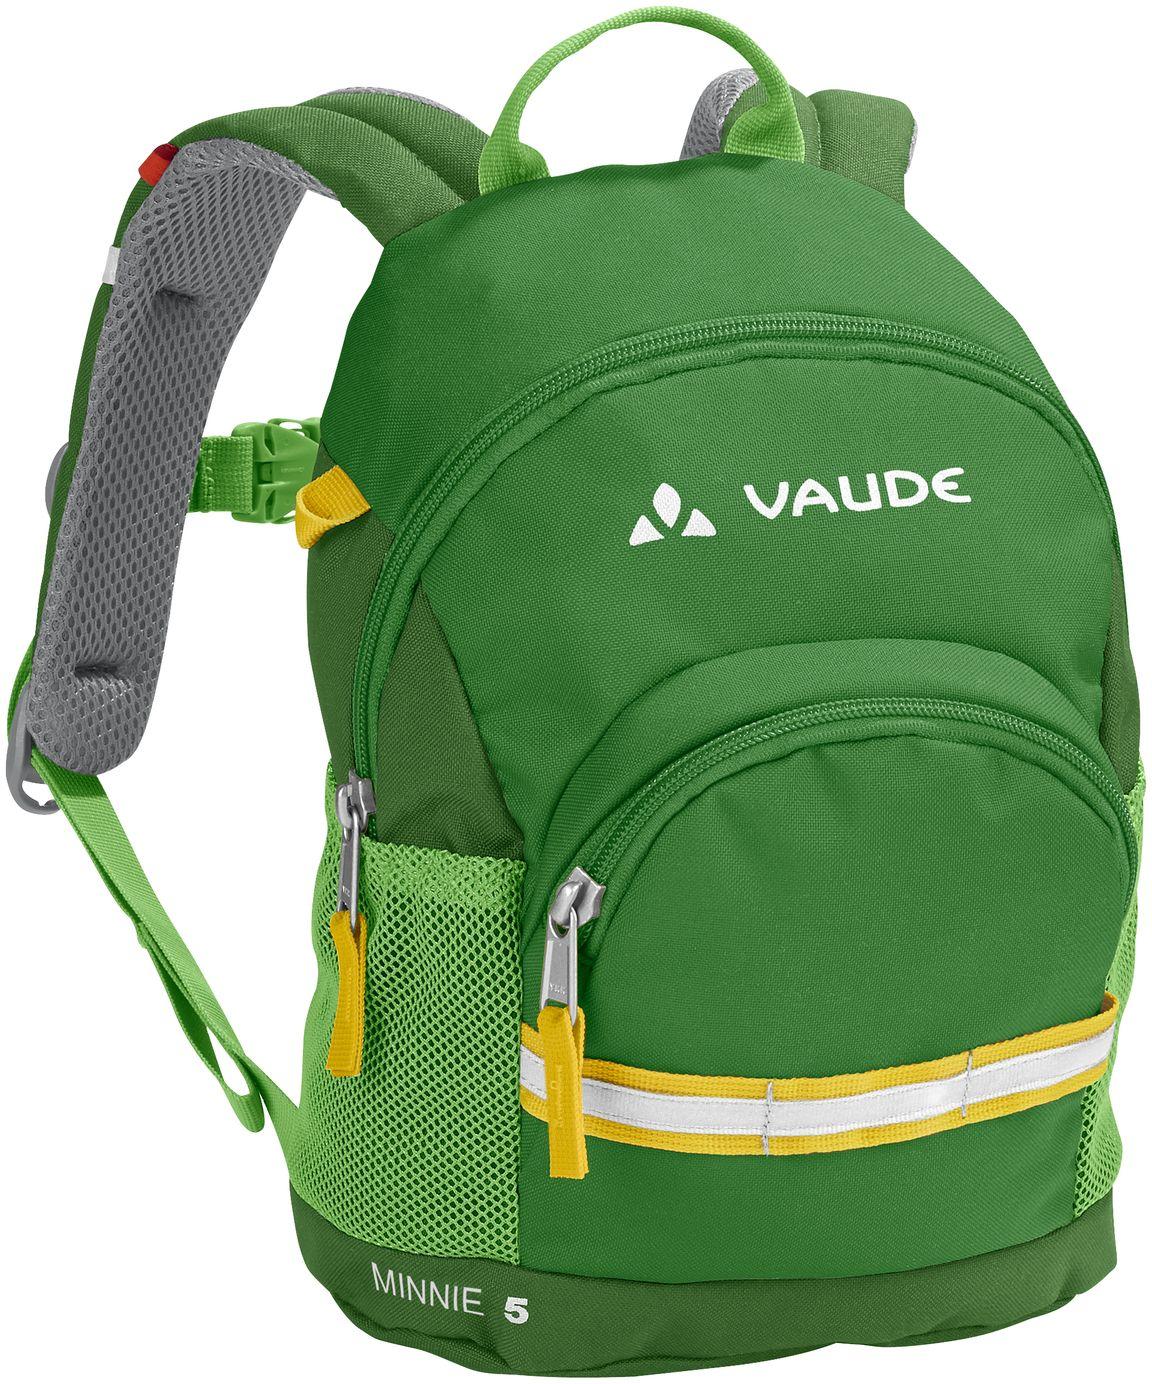 e8ede330cfe Dětský batoh Vaude Minnie 5 - parrot green - Skibi Kids